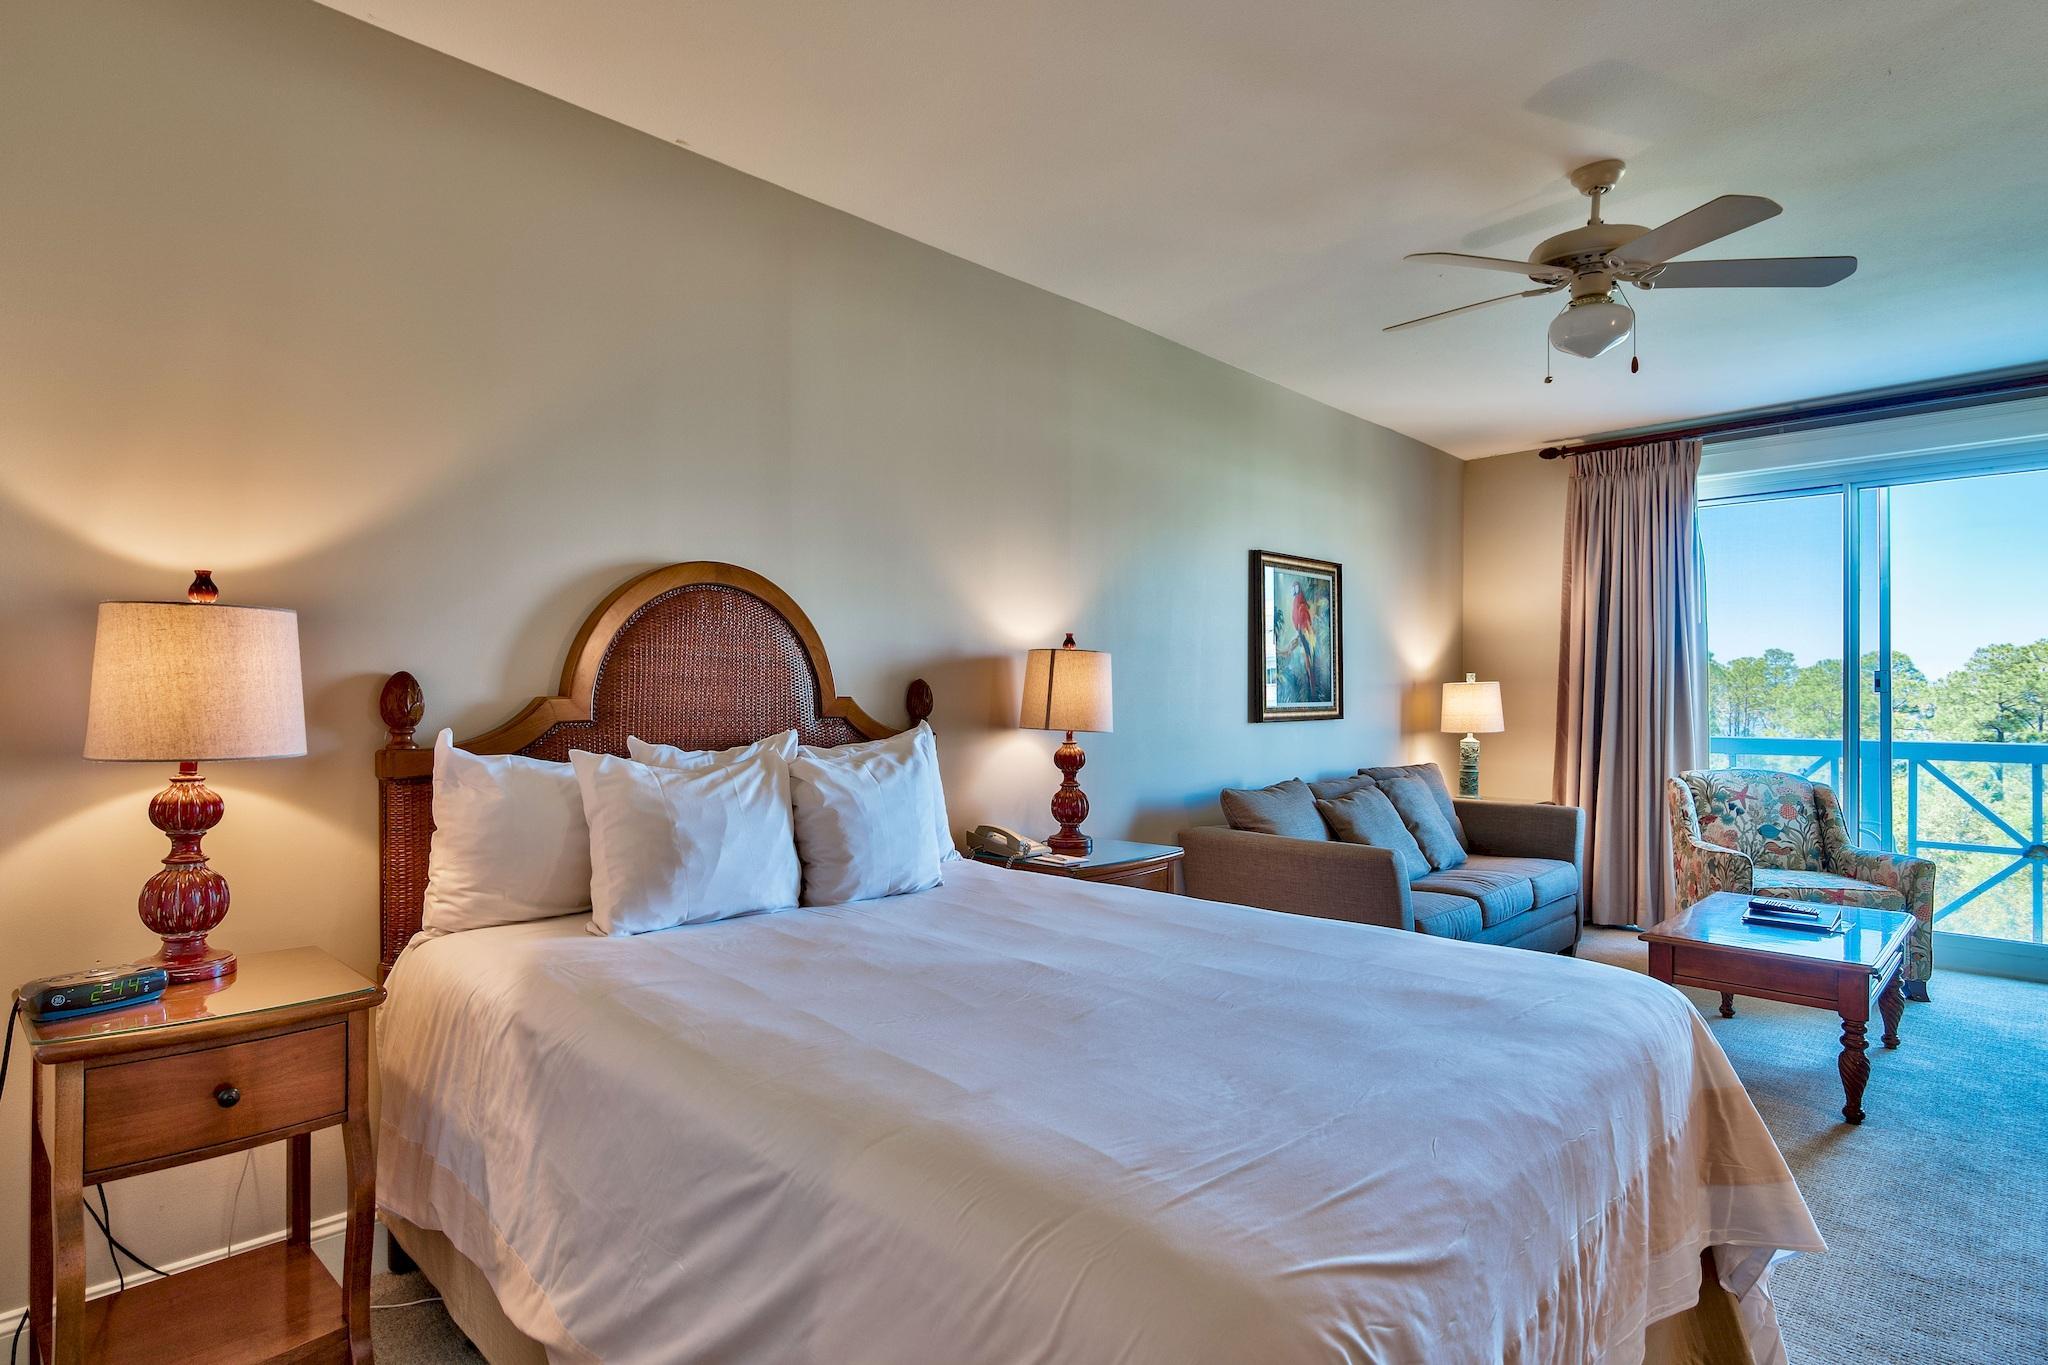 A 0 Bedroom 1 Bedroom Grand Sandestin The Condominium